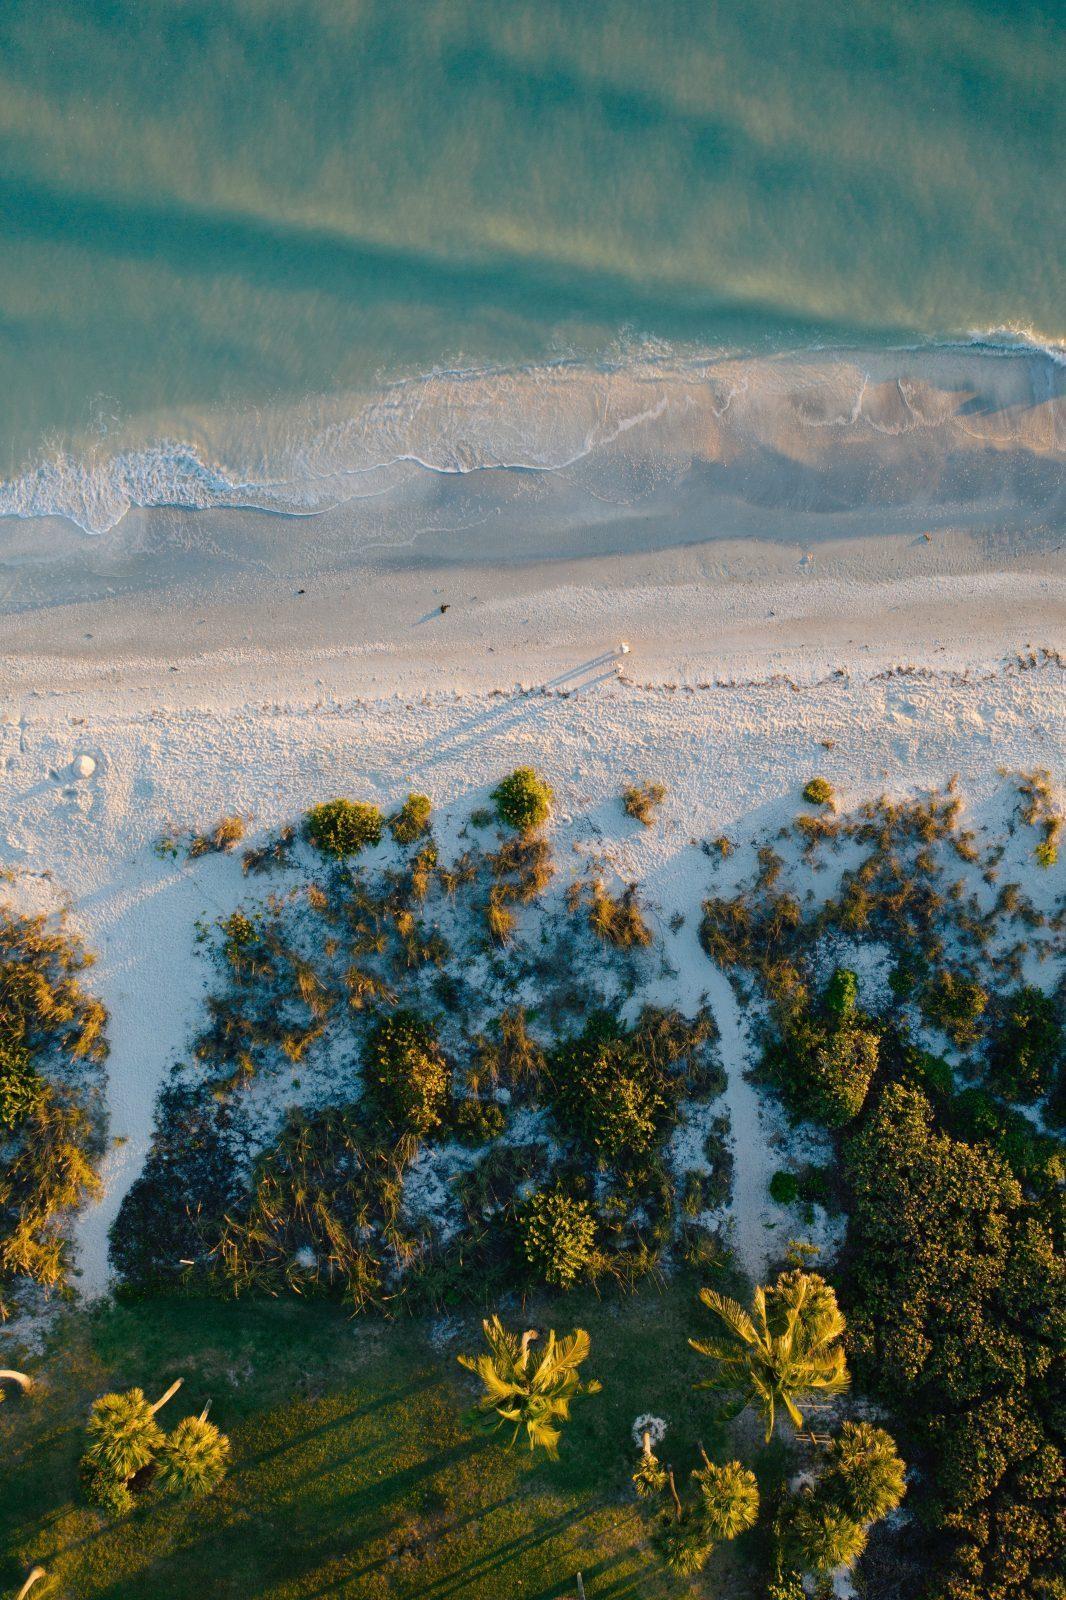 Sanibel Island. photo credit: Drew Darby/Unsplash